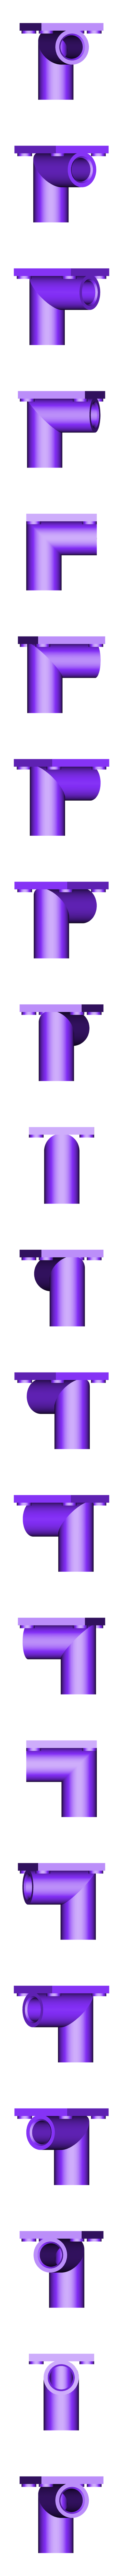 P&B_13.stl Download free STL file P & B ARMY (PIPE AND BOARD) • 3D printable model, DJER